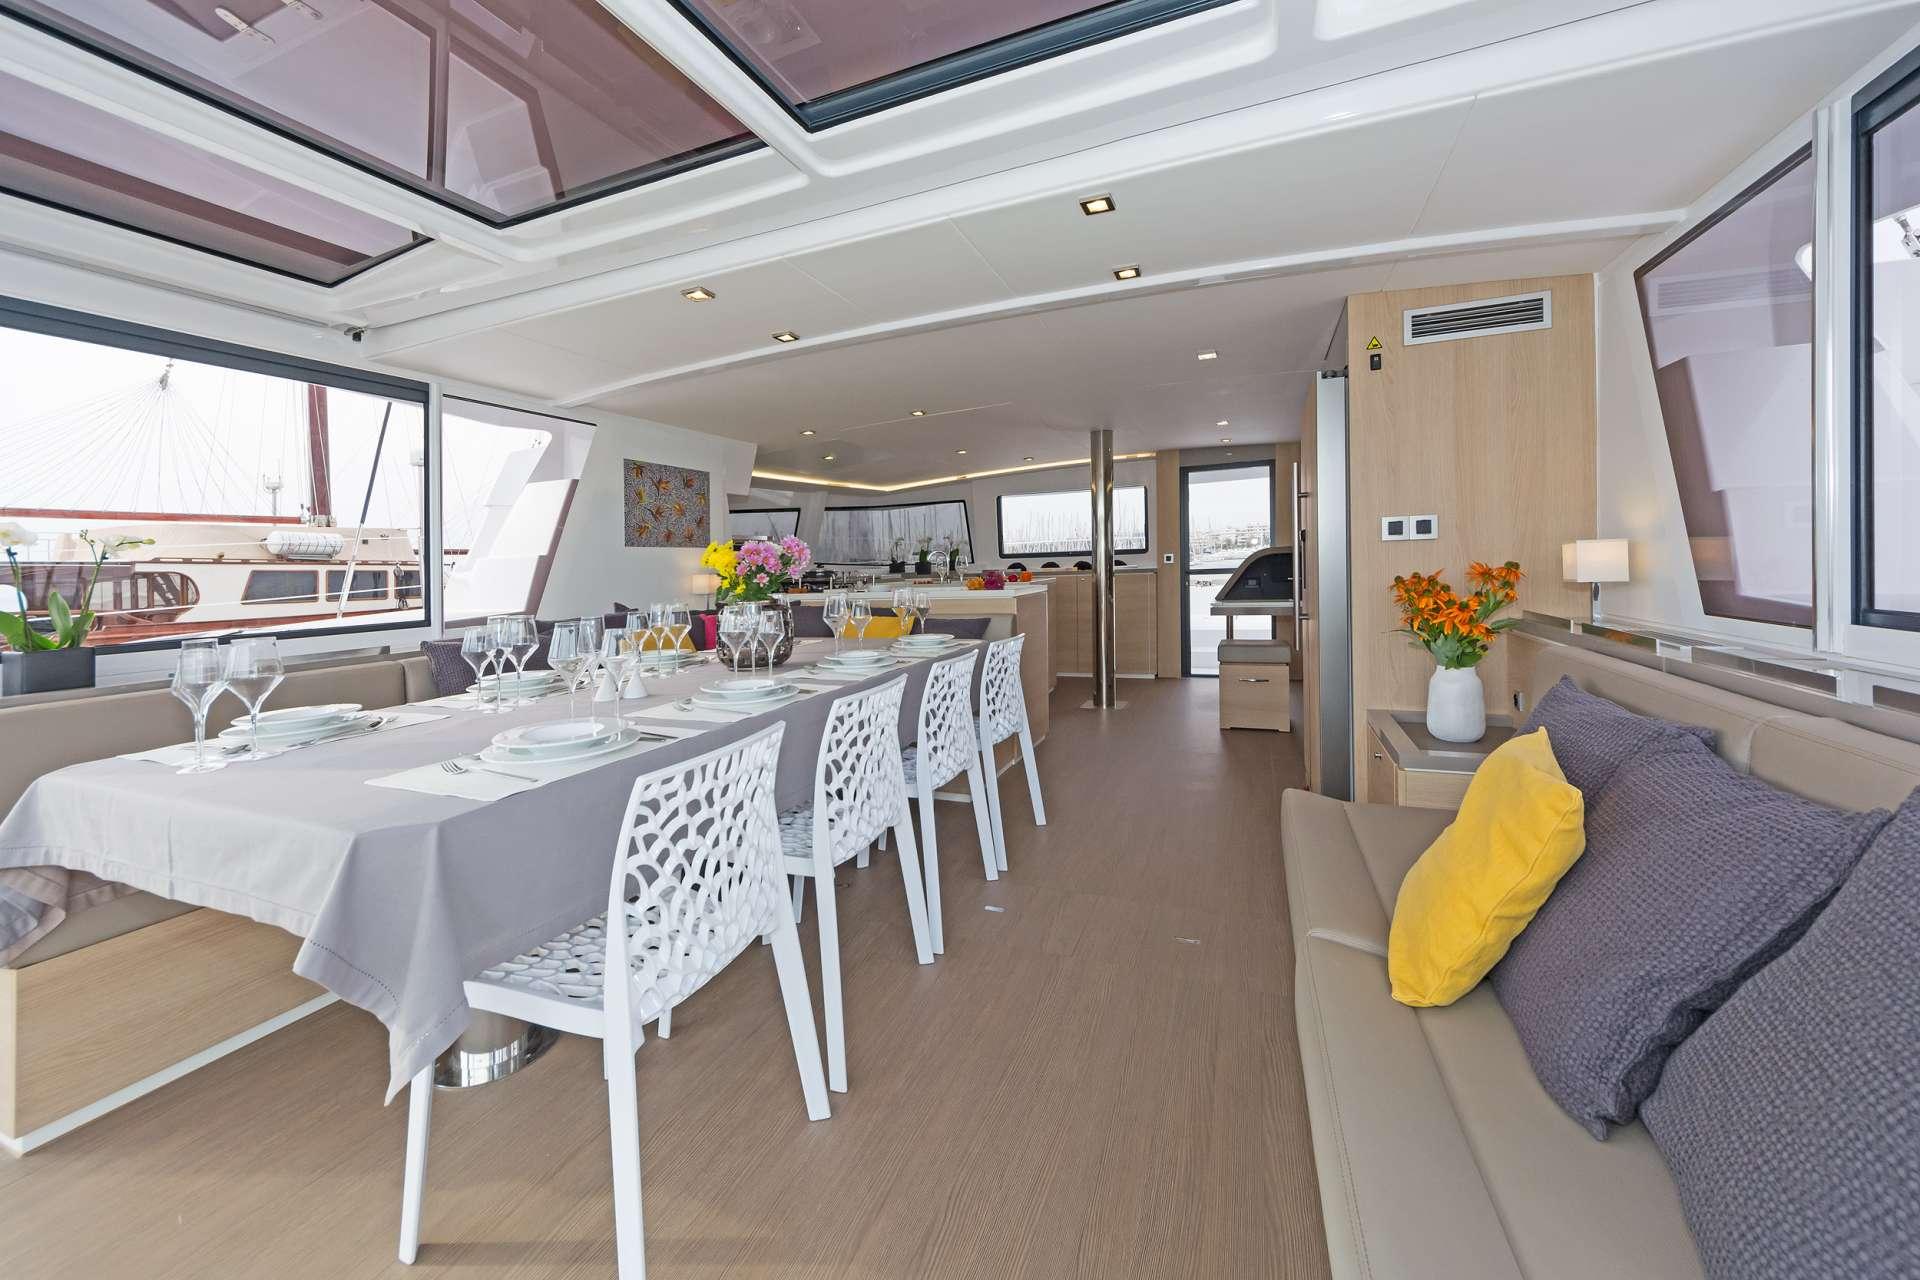 Cat Yacht 'Cat', 10 PAX, 3 Crew, 55.00 Ft, 16.00 Meters, Built 2019, Catana S.A, Refit Year